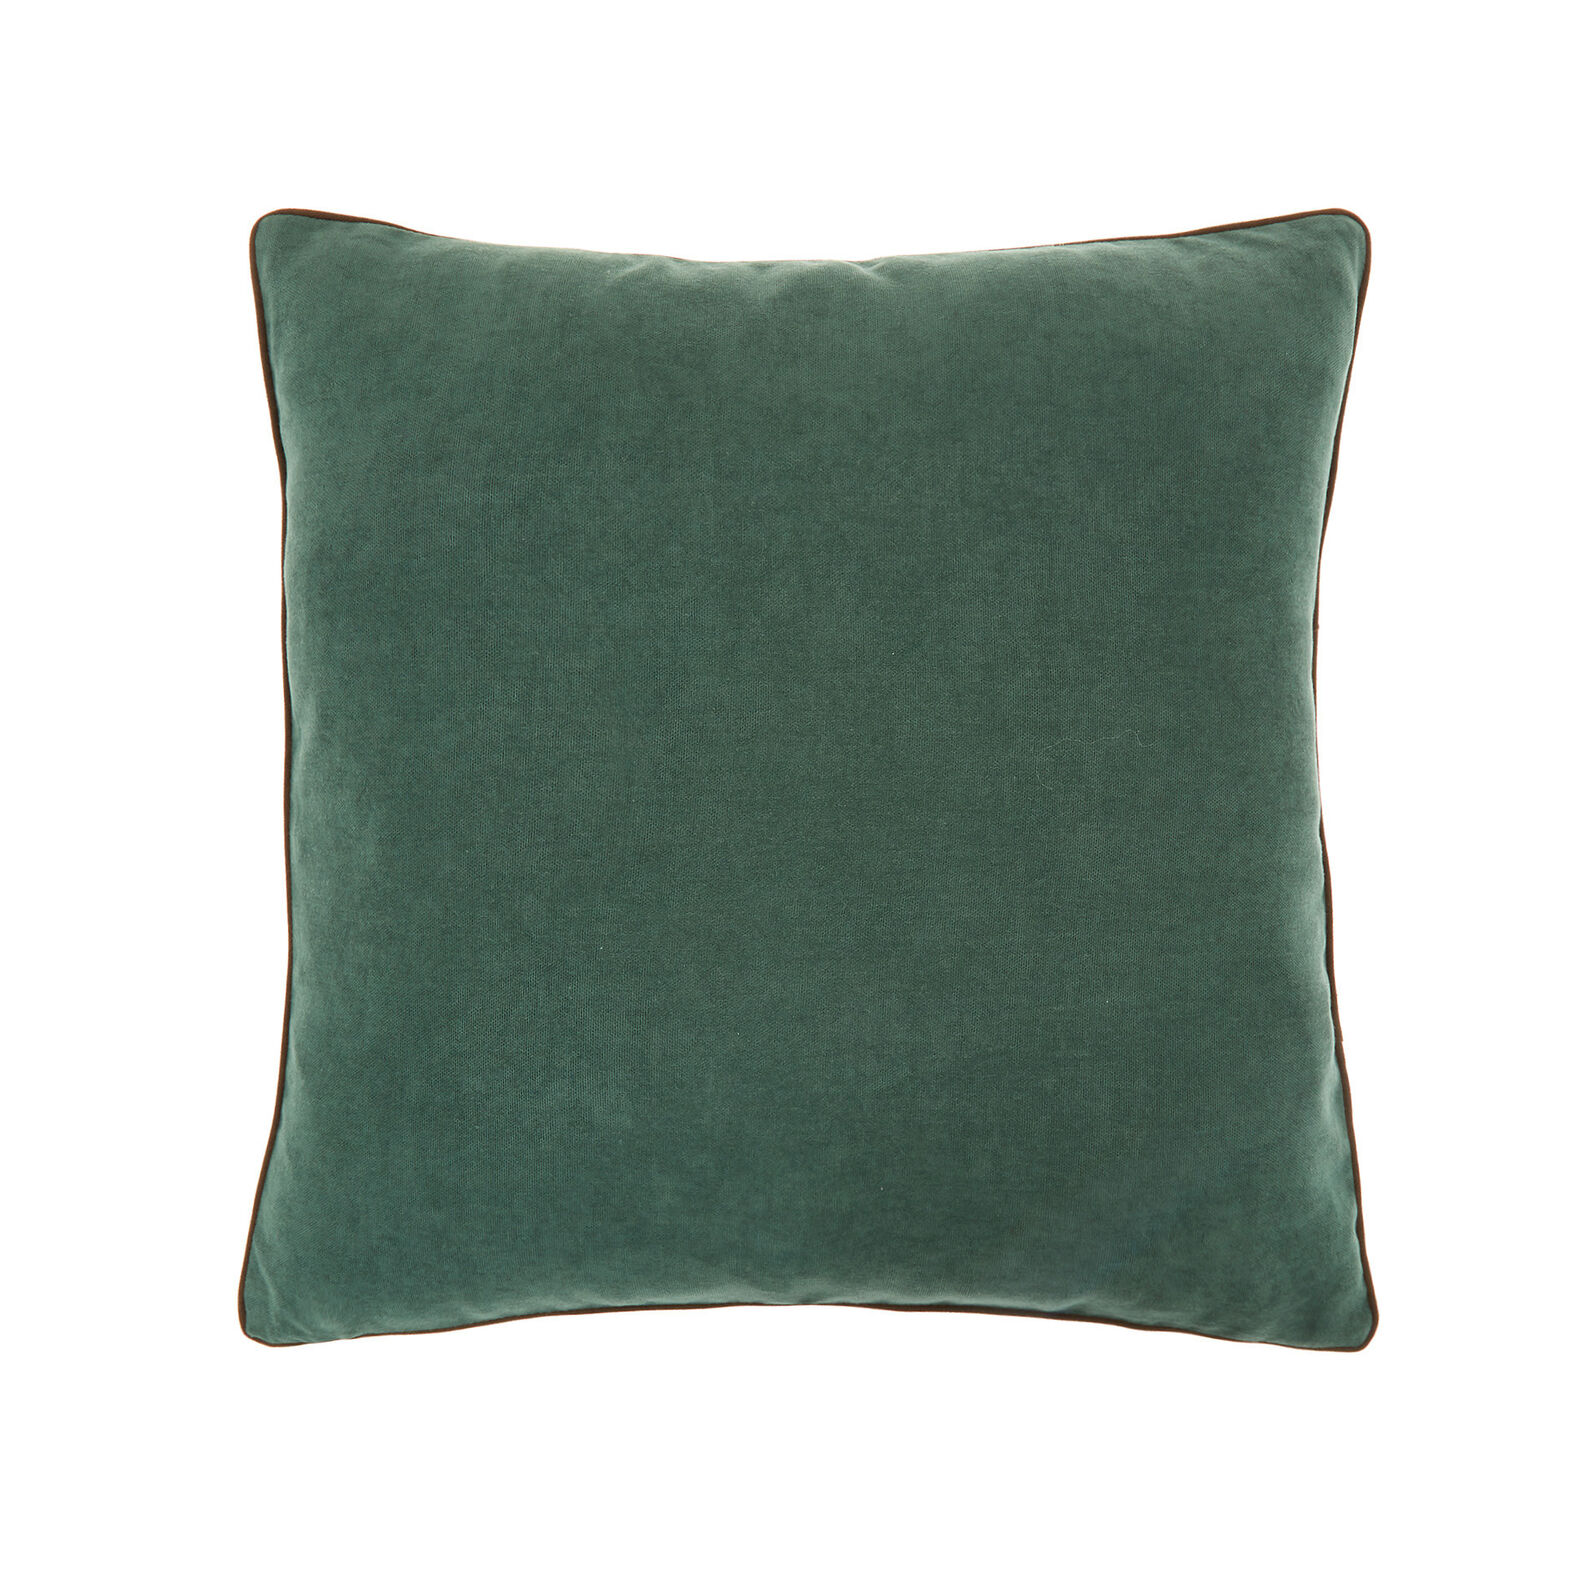 Solid colour fabric cushion (50x50cm)